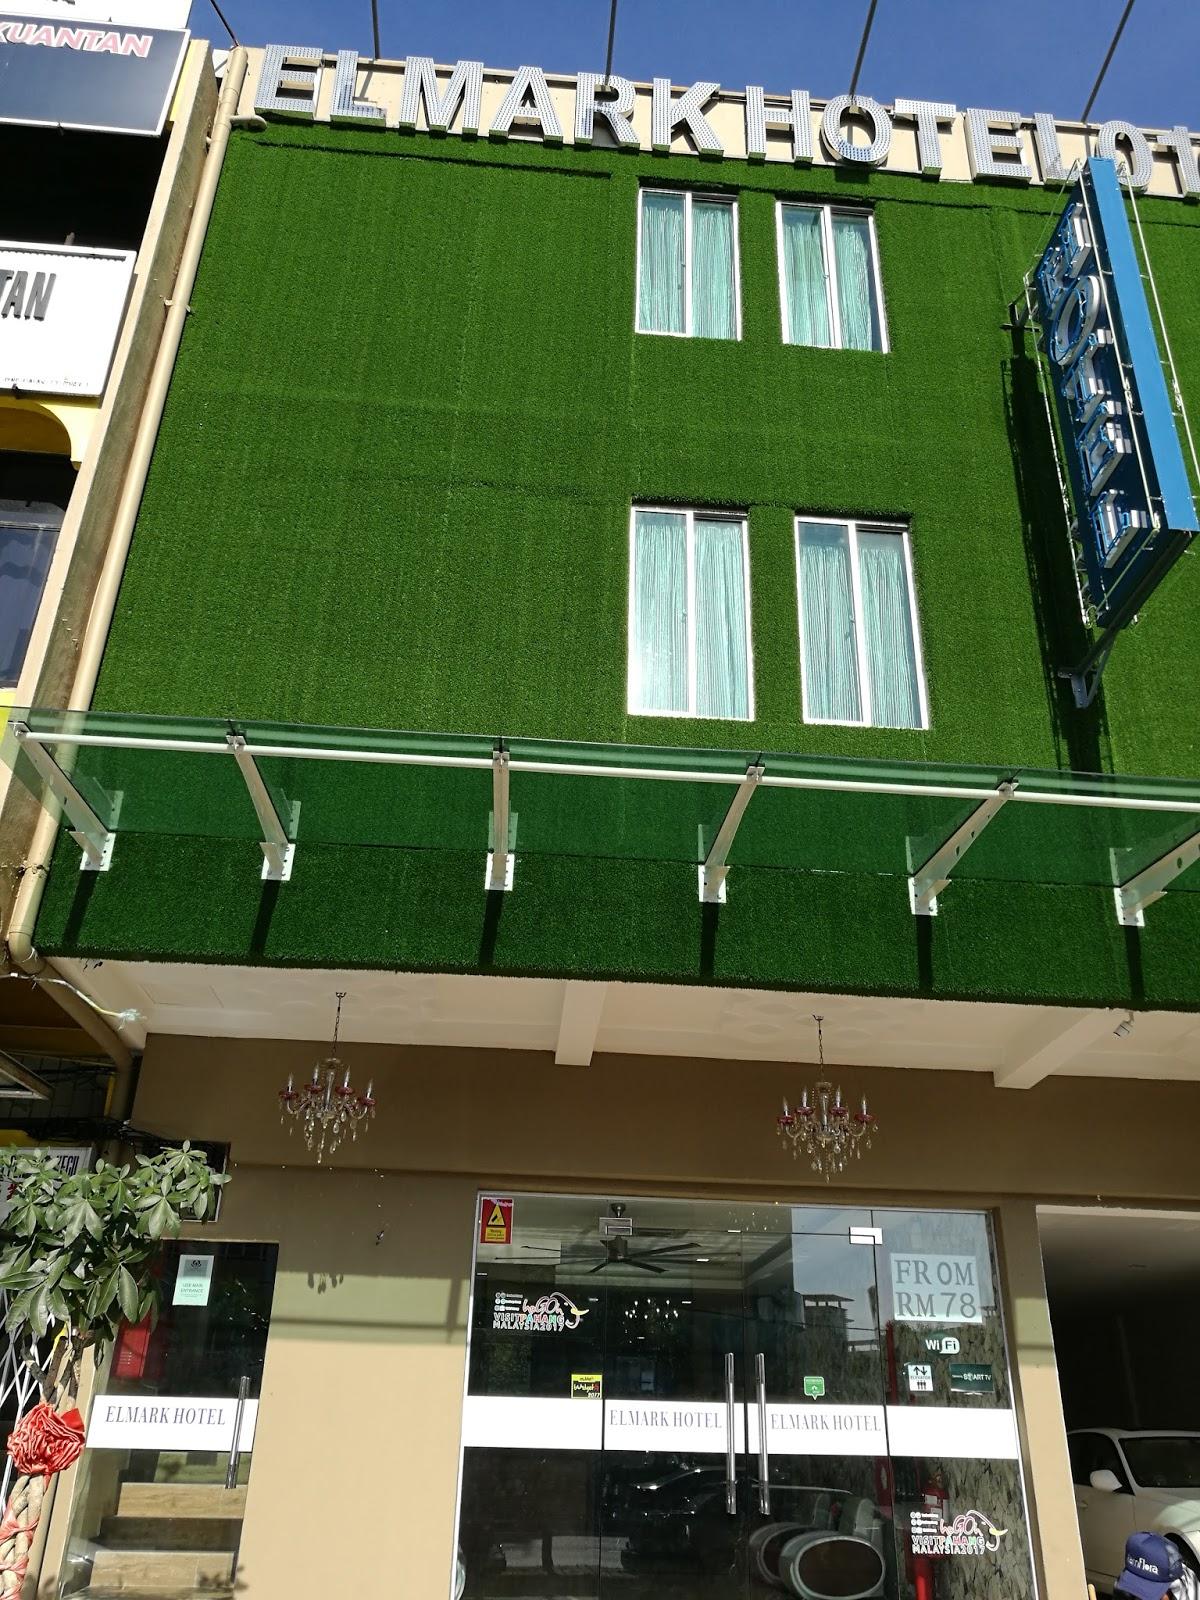 Den Booking Through Agoda Dengan Harga RM 86 Untuk 1 Malam Bilik Katil Queen Semua Kemudahan Yang Biasa Ada Di Hotel Bajet Iaitu